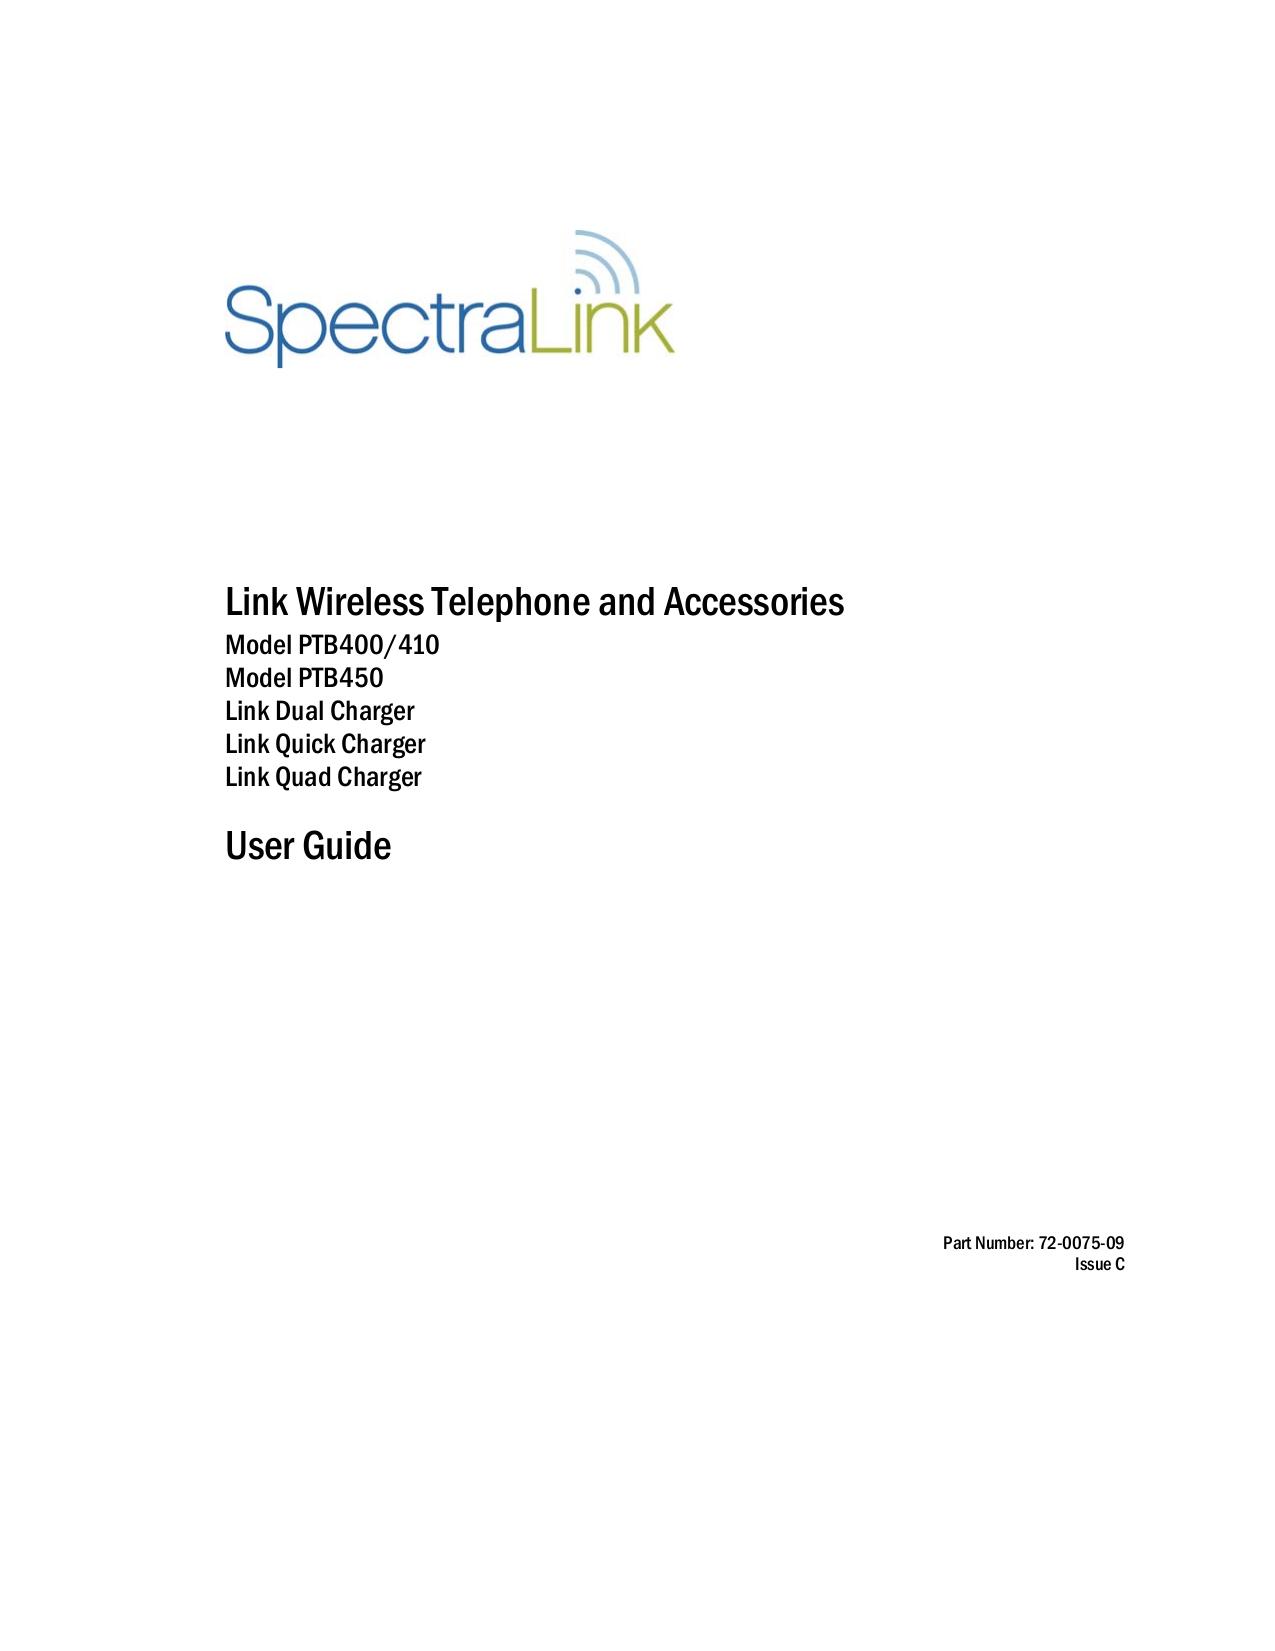 download free pdf for spectralink ptb410 telephone manual rh umlib com Online User Guide User Guide Icon